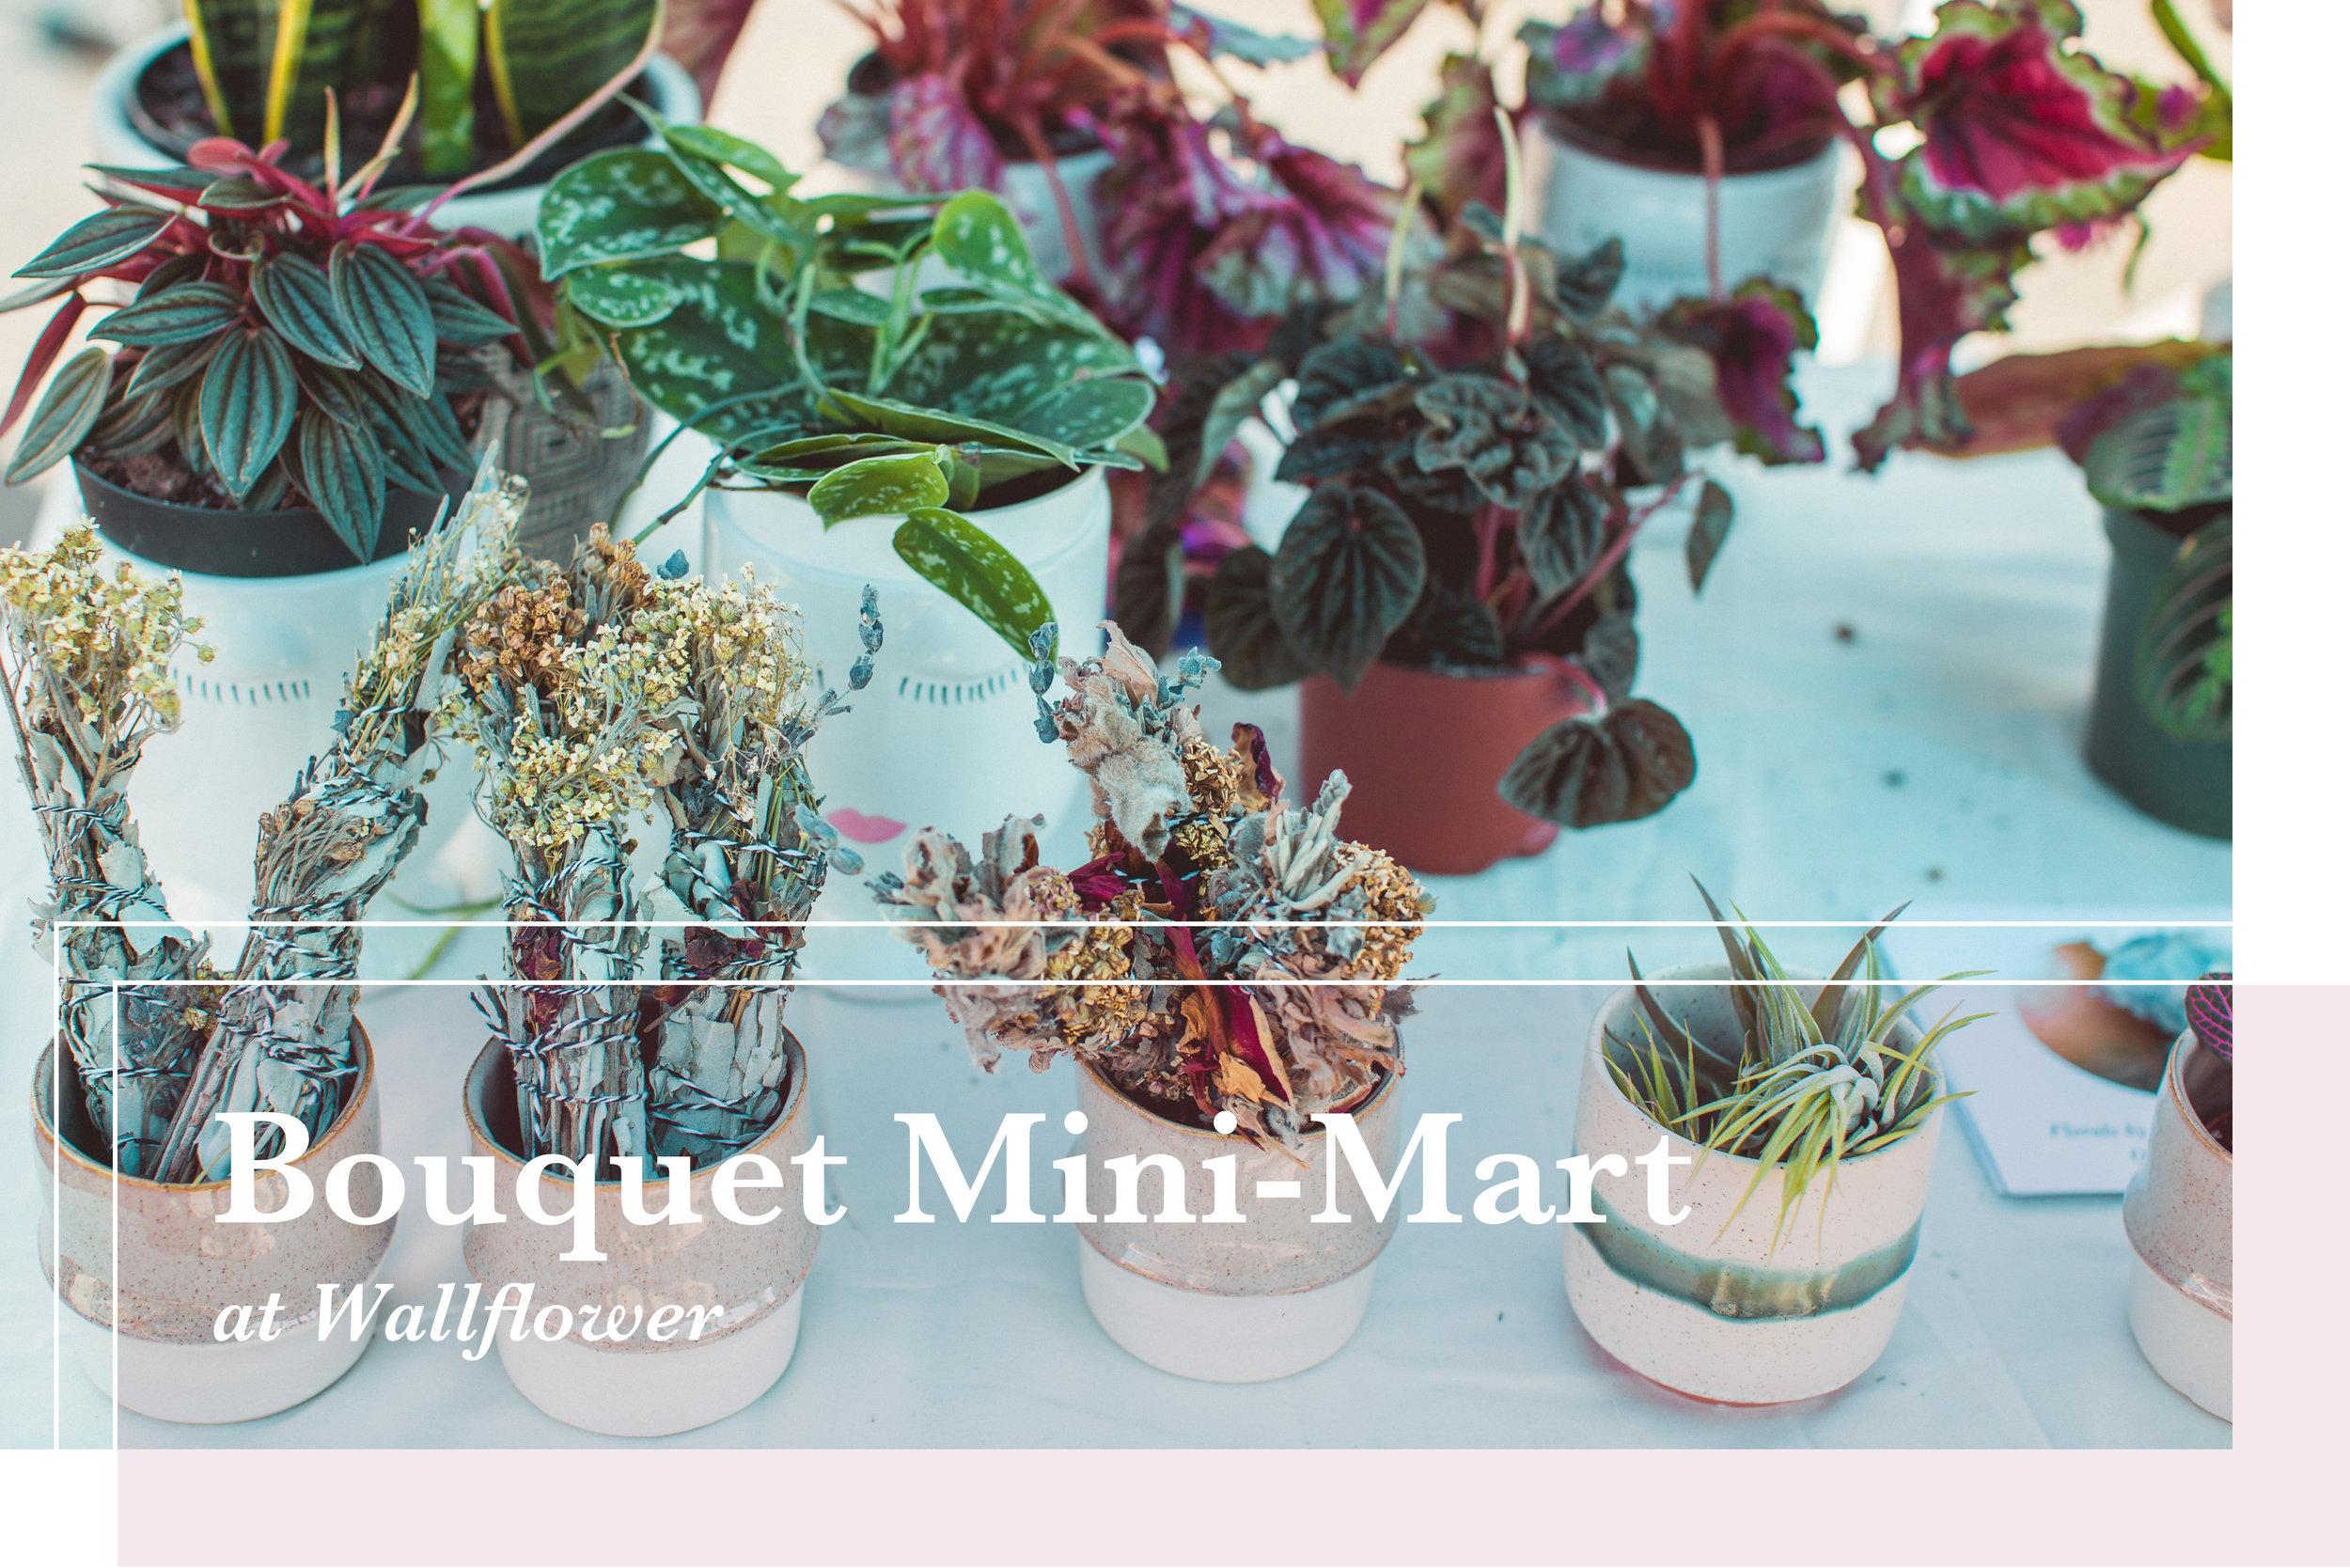 BouquetMiniMarket-EventBanner-01.jpg